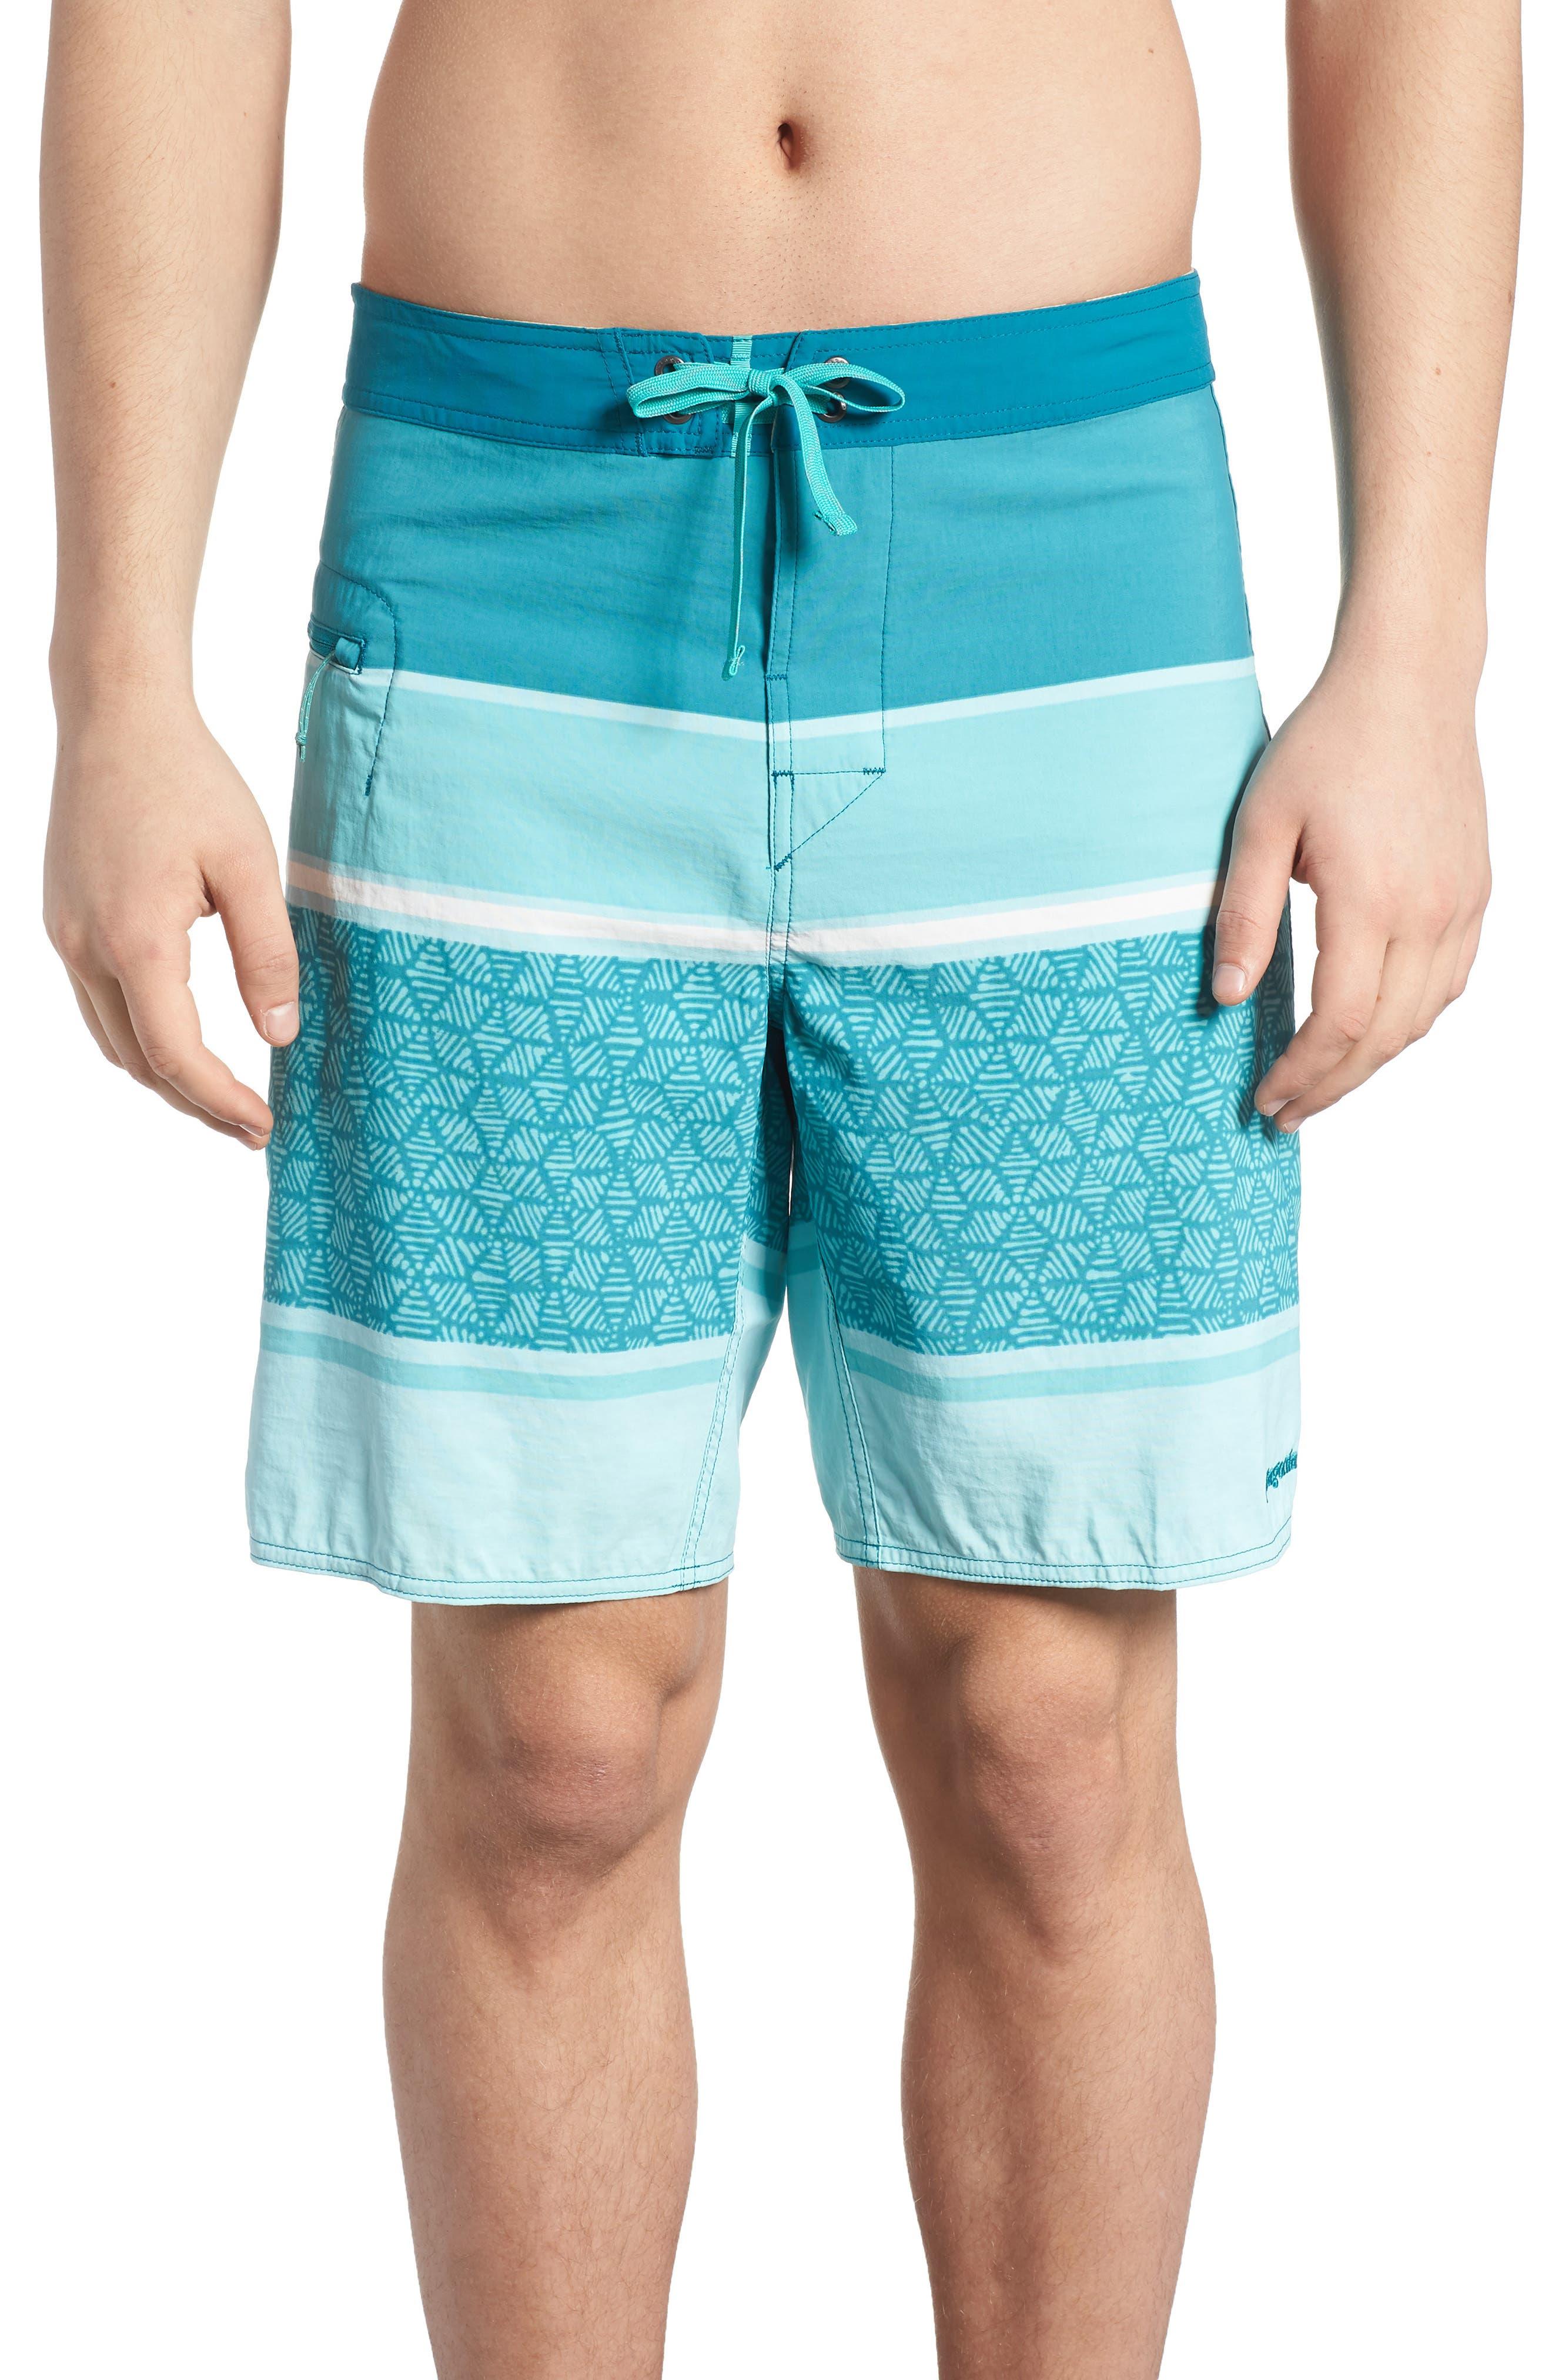 PATAGONIA Wavefarer Board Shorts, Main, color, 404